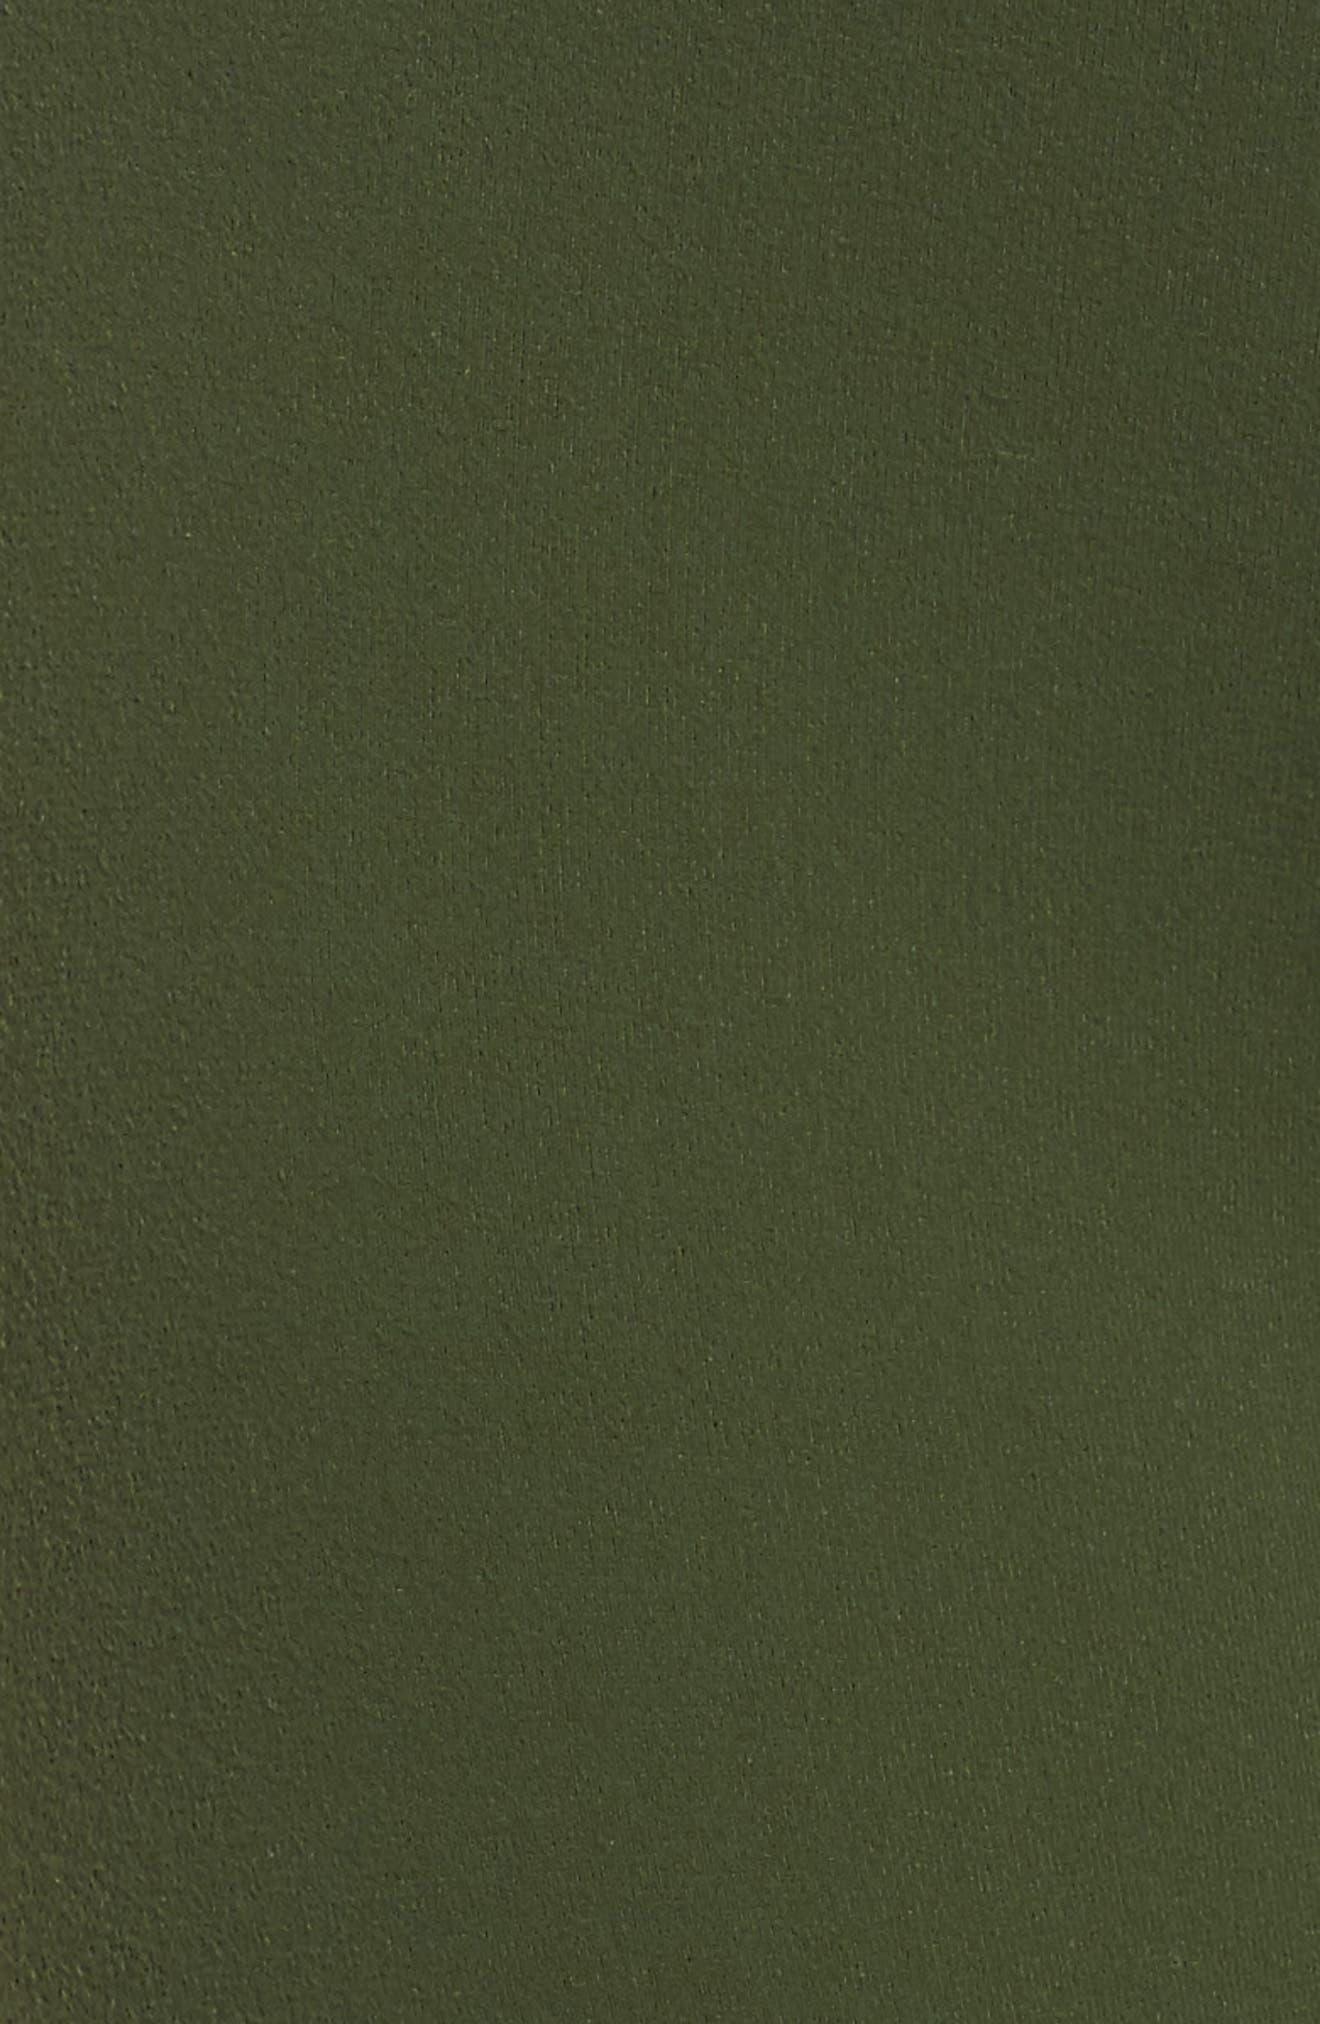 High Waist Capri Leggings,                             Alternate thumbnail 6, color,                             Jungle Palm